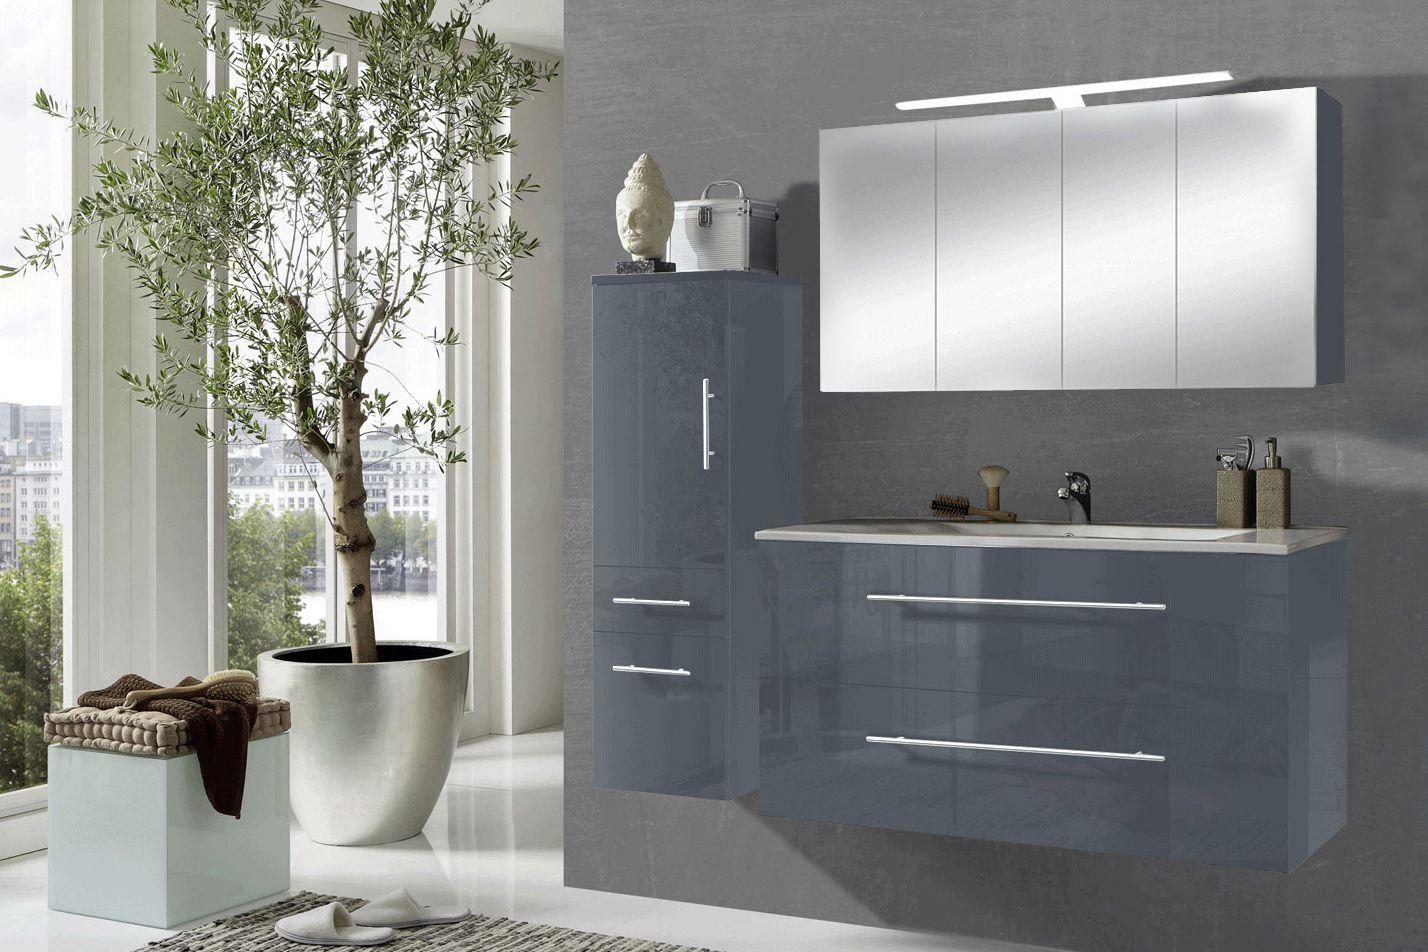 Badezimmer komplettset ~ Sam® 3tlg. badezimmer set grau 120 cm rom spiegelschrank auf lager